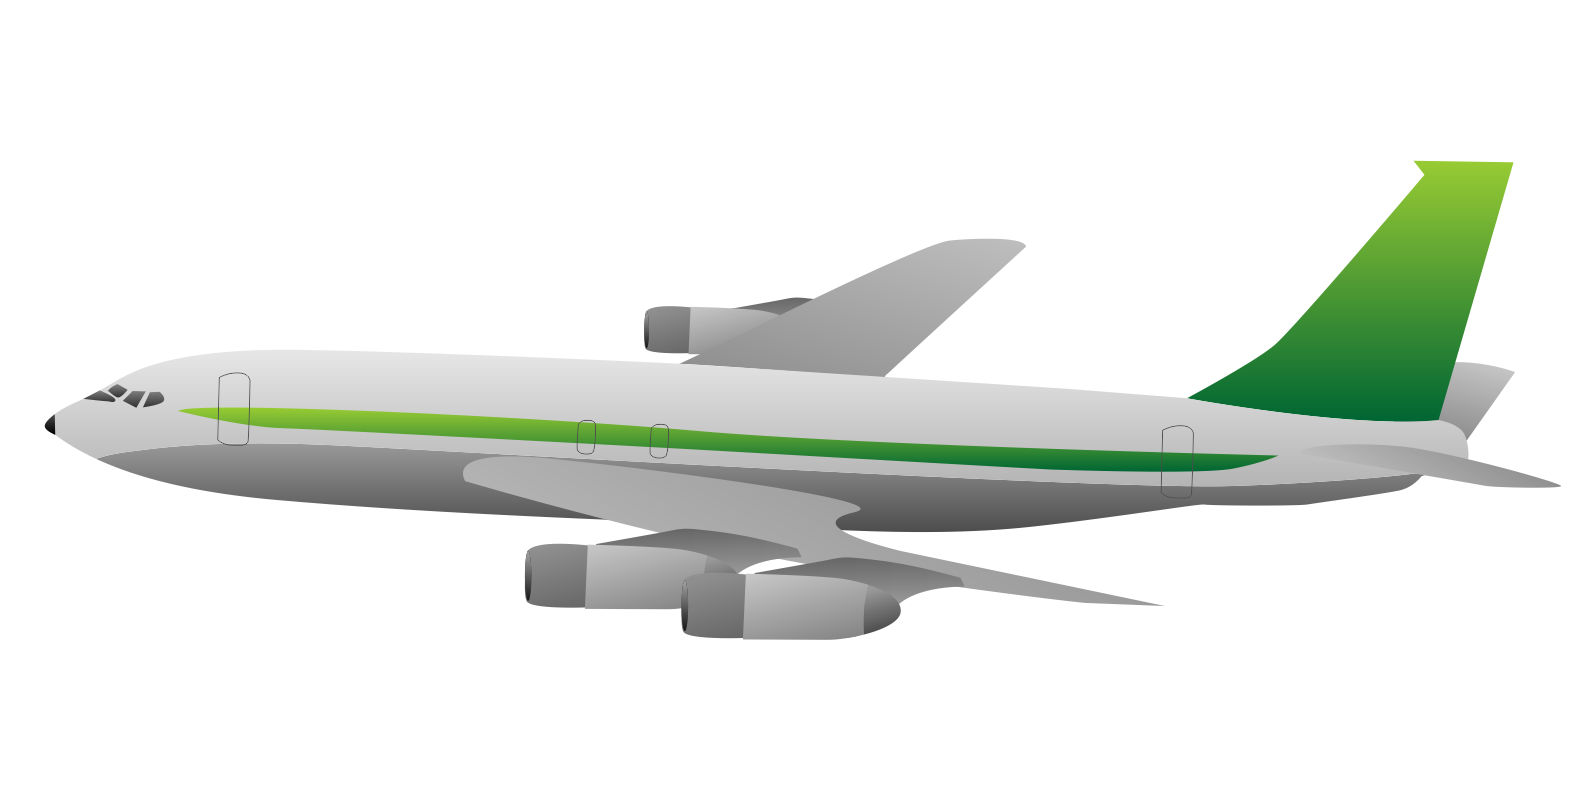 Avion PNG - 160377